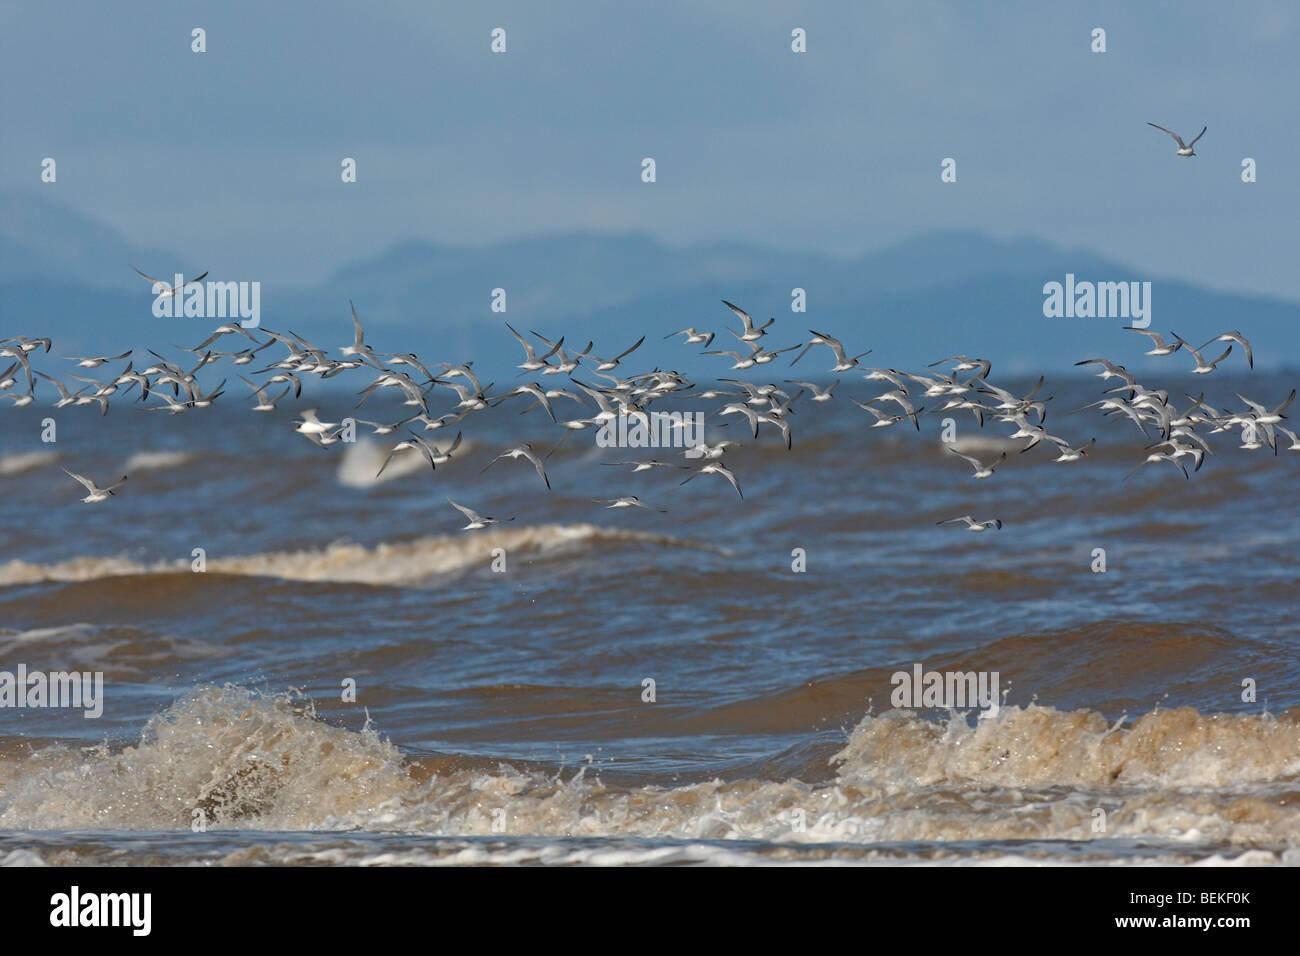 Little terns (Sterna albifrons) in flight over breakers - Stock Image